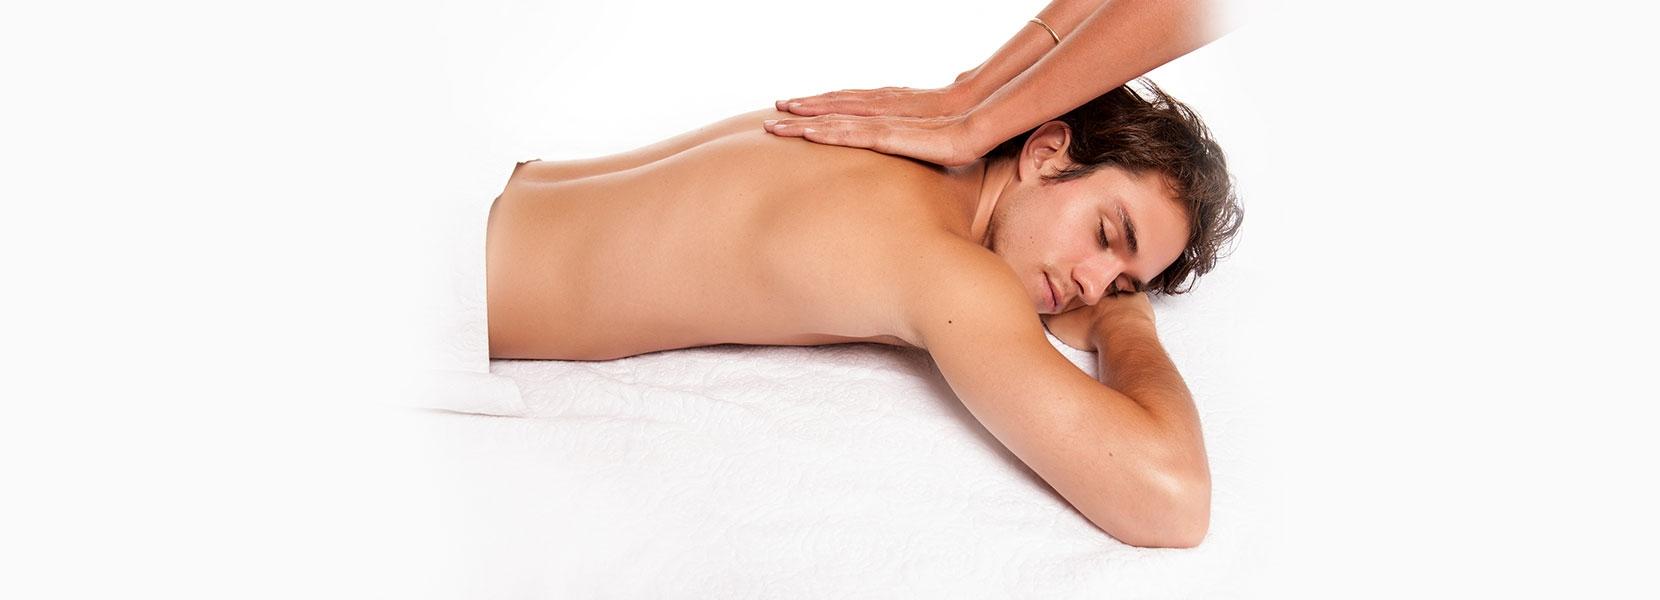 Nuru Massage London (@nurumassagelondon) Cover Image